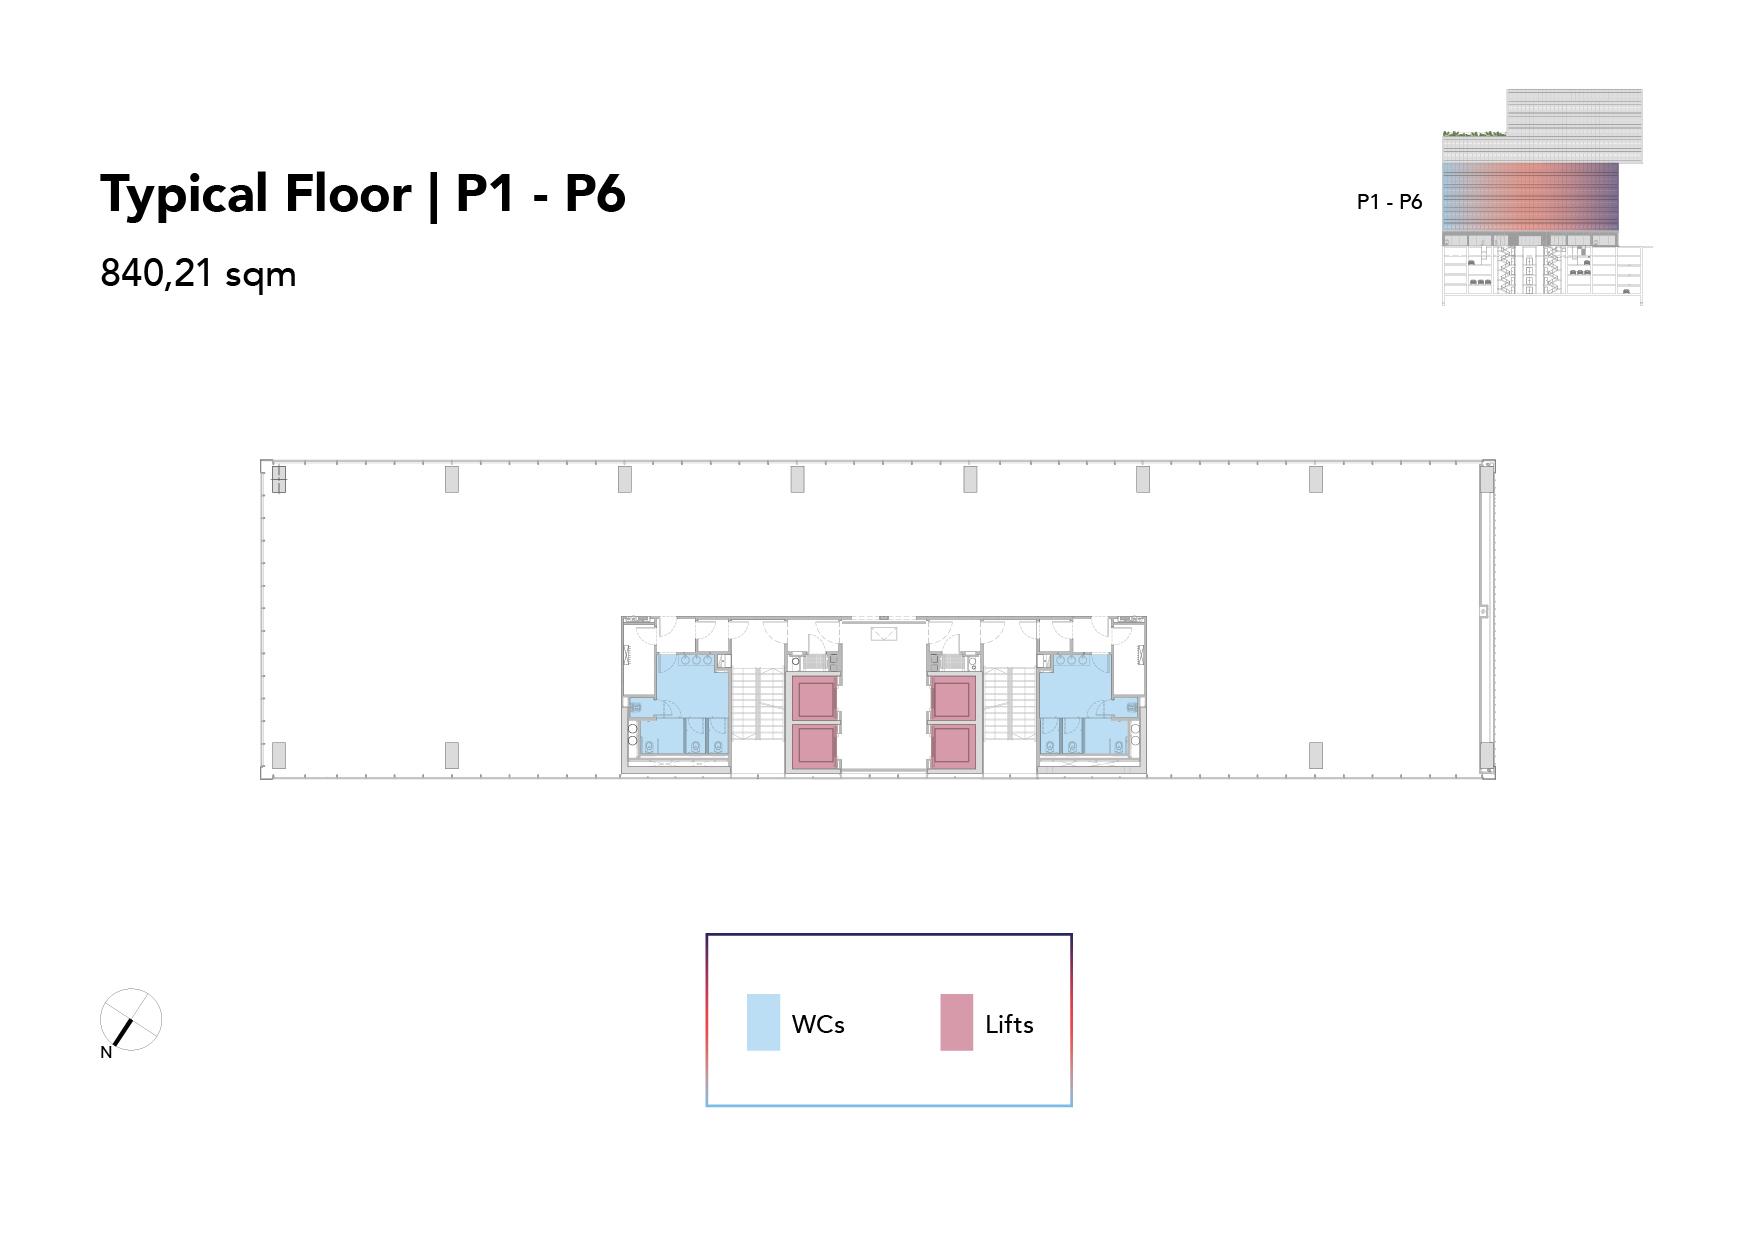 Typical Floor | P1 - P6